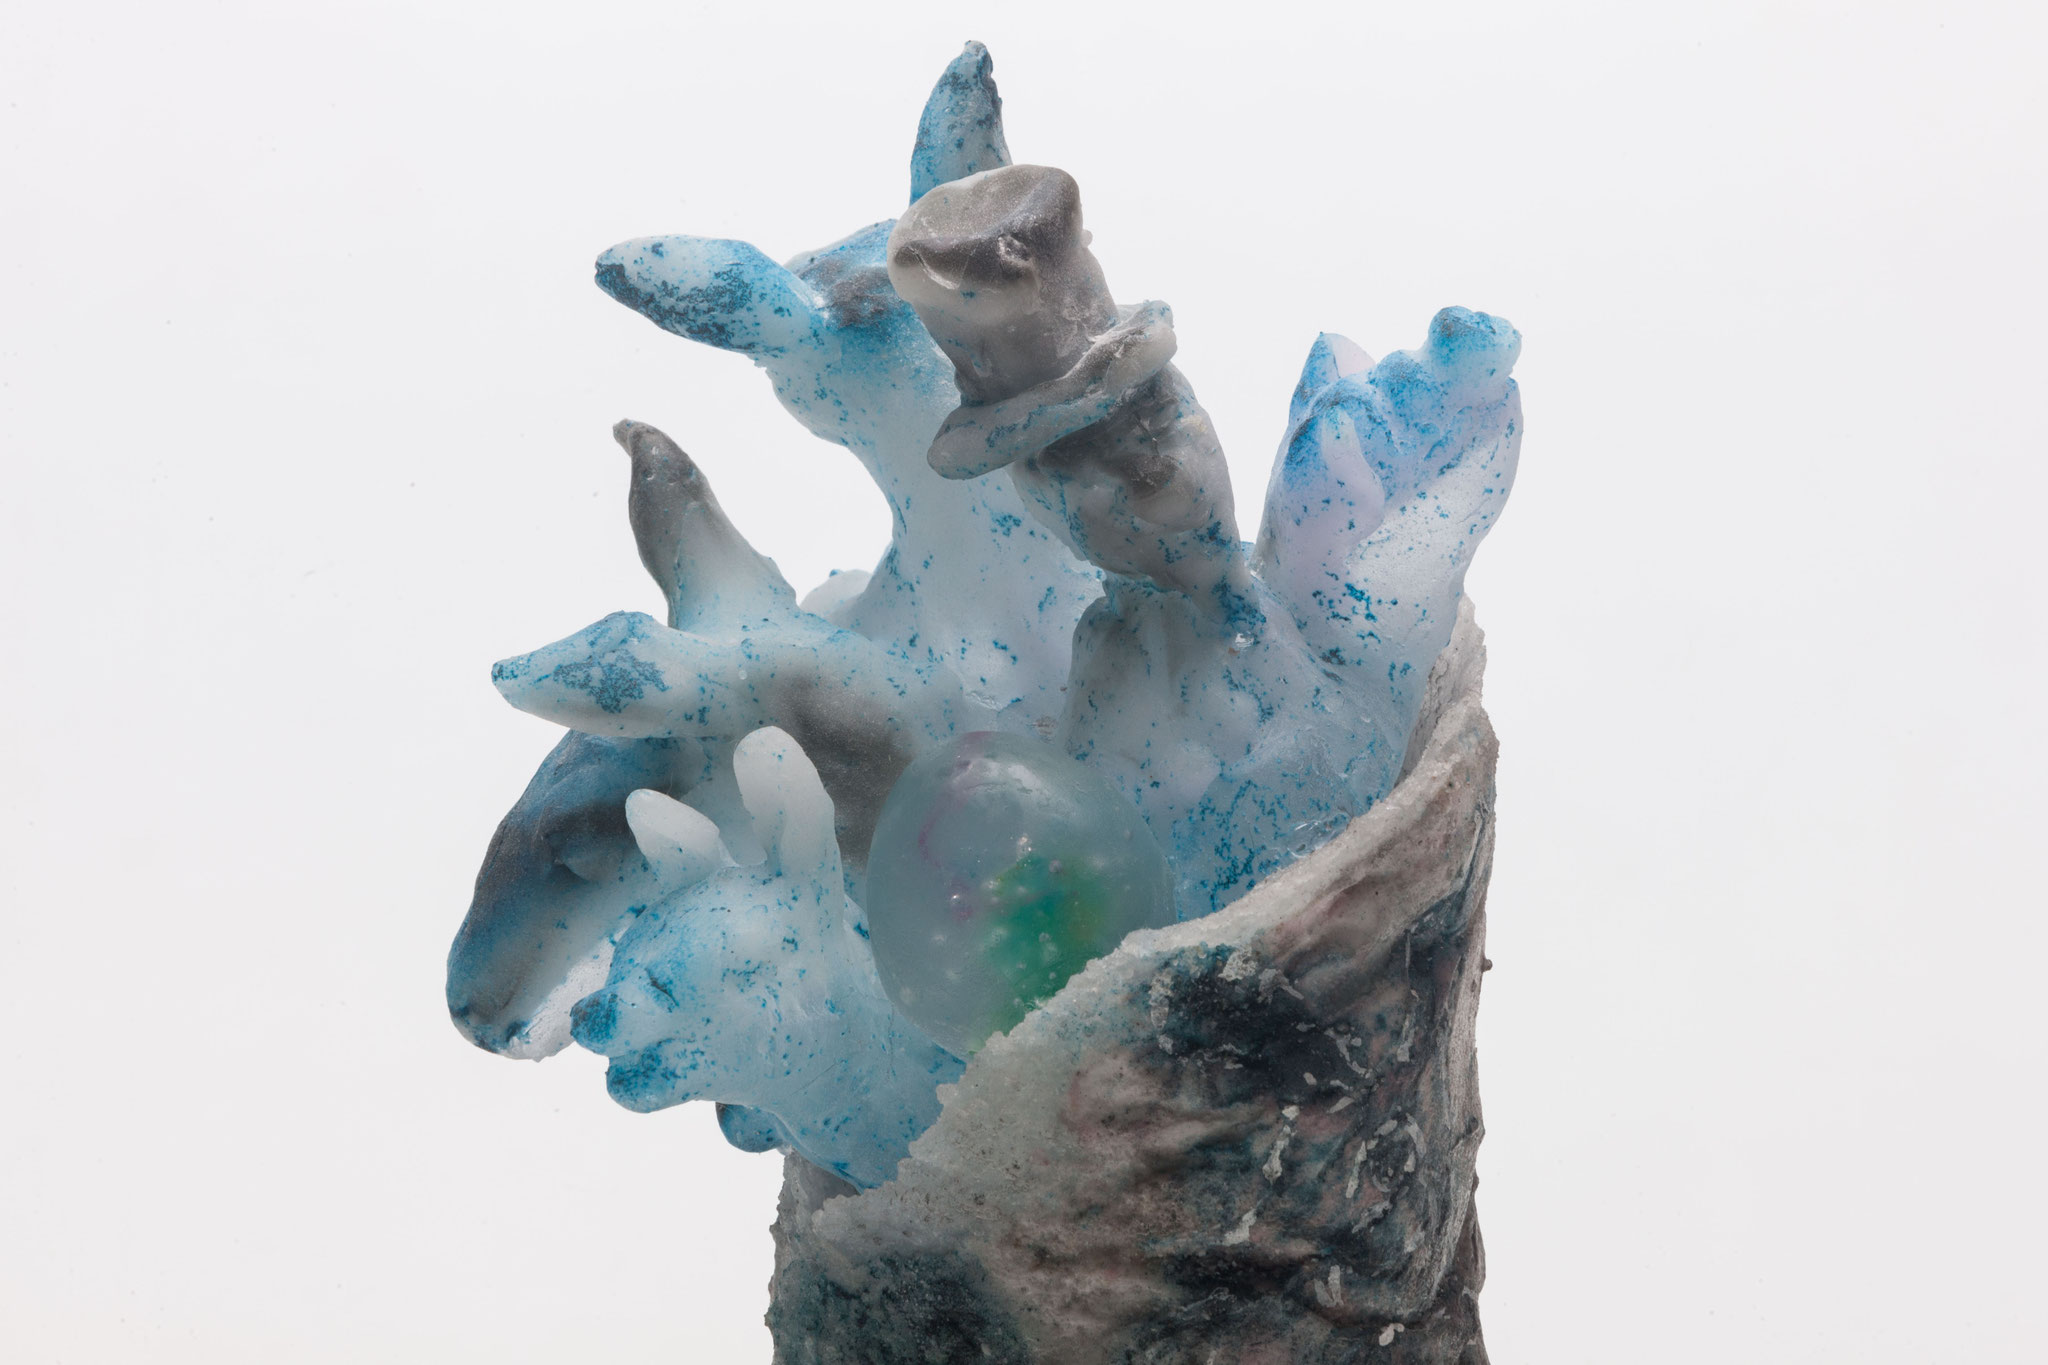 2016 sculpture